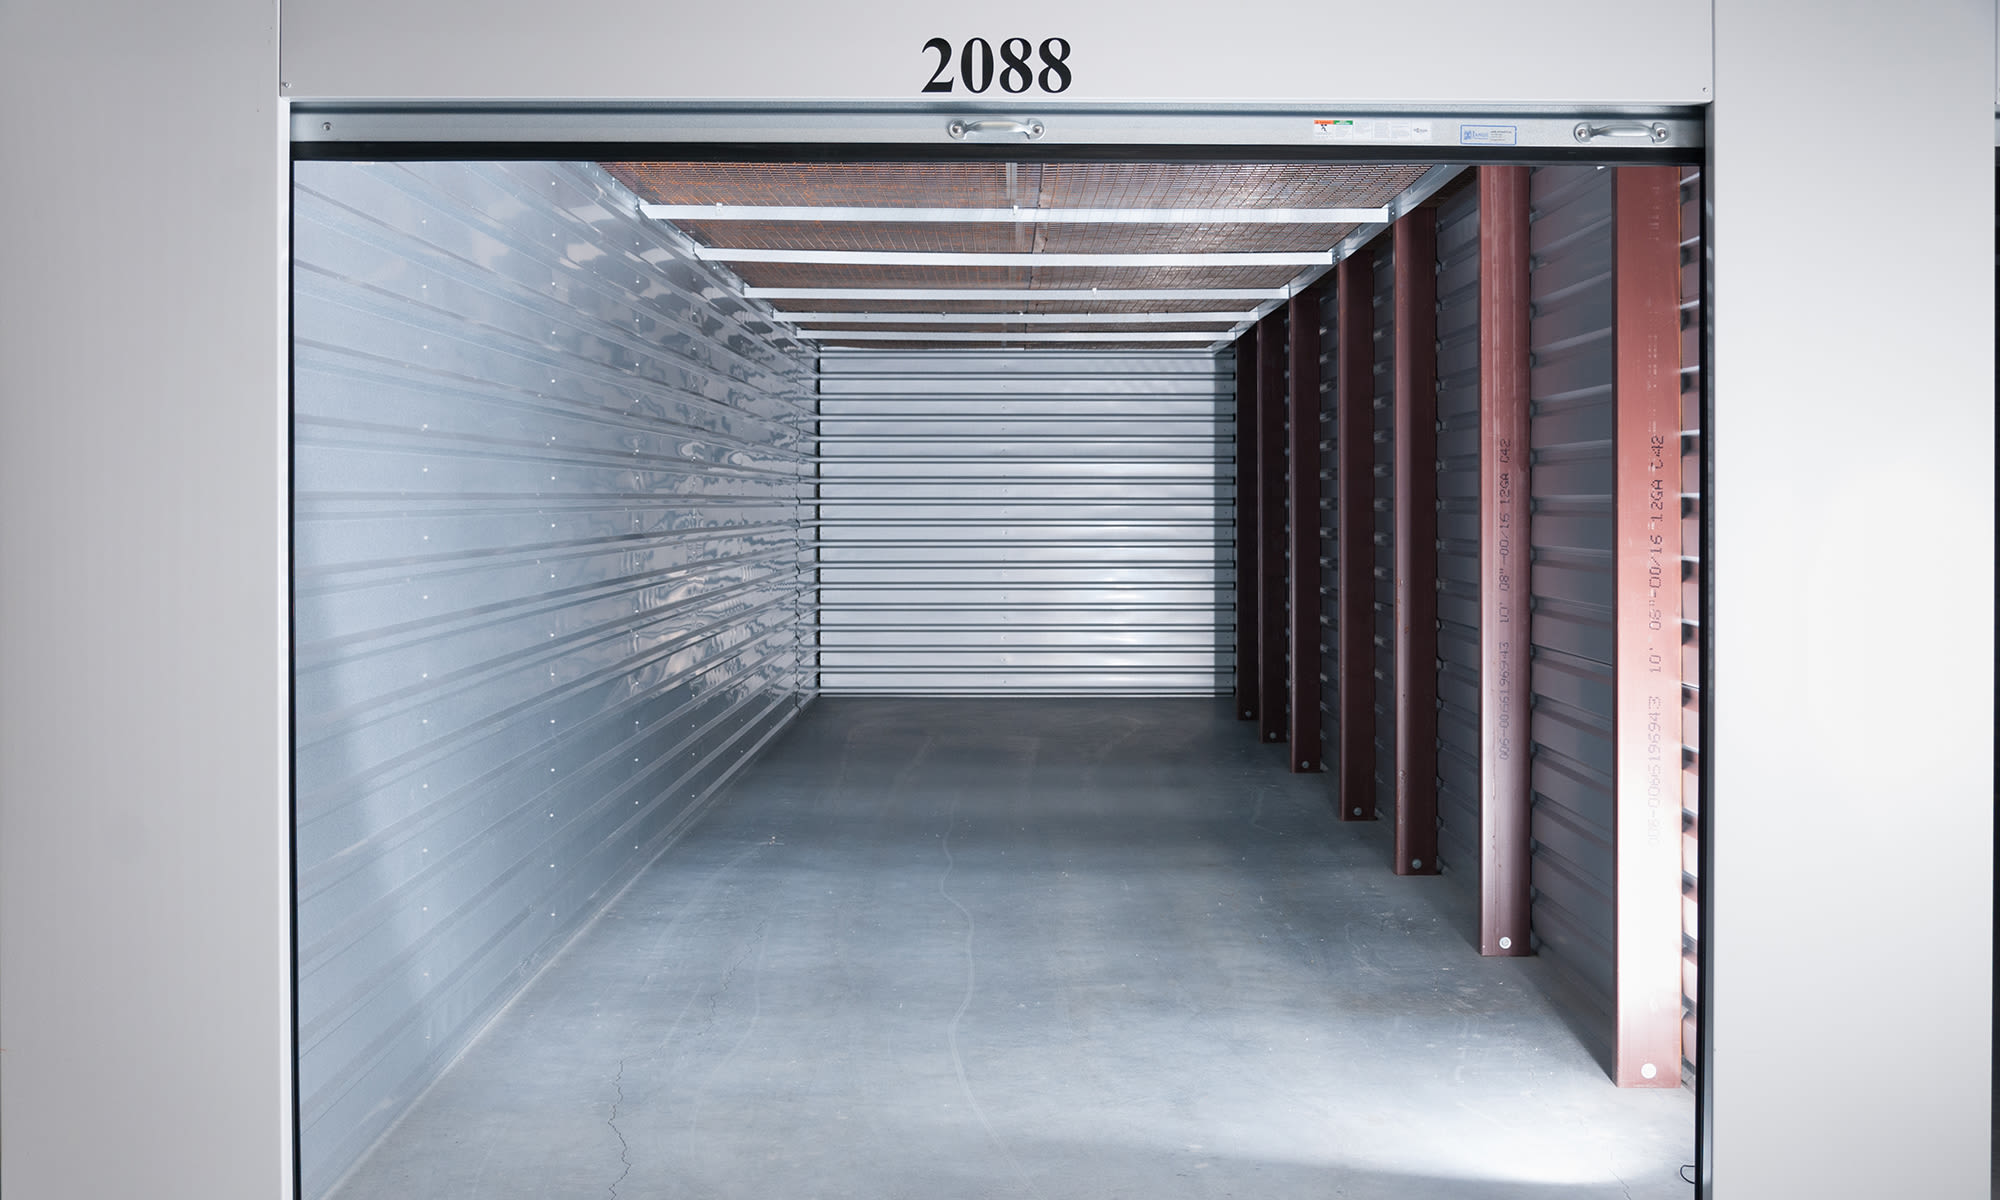 Extra Large Units at Virginia Varsity Self Storage in Roanoke, Virginia is located